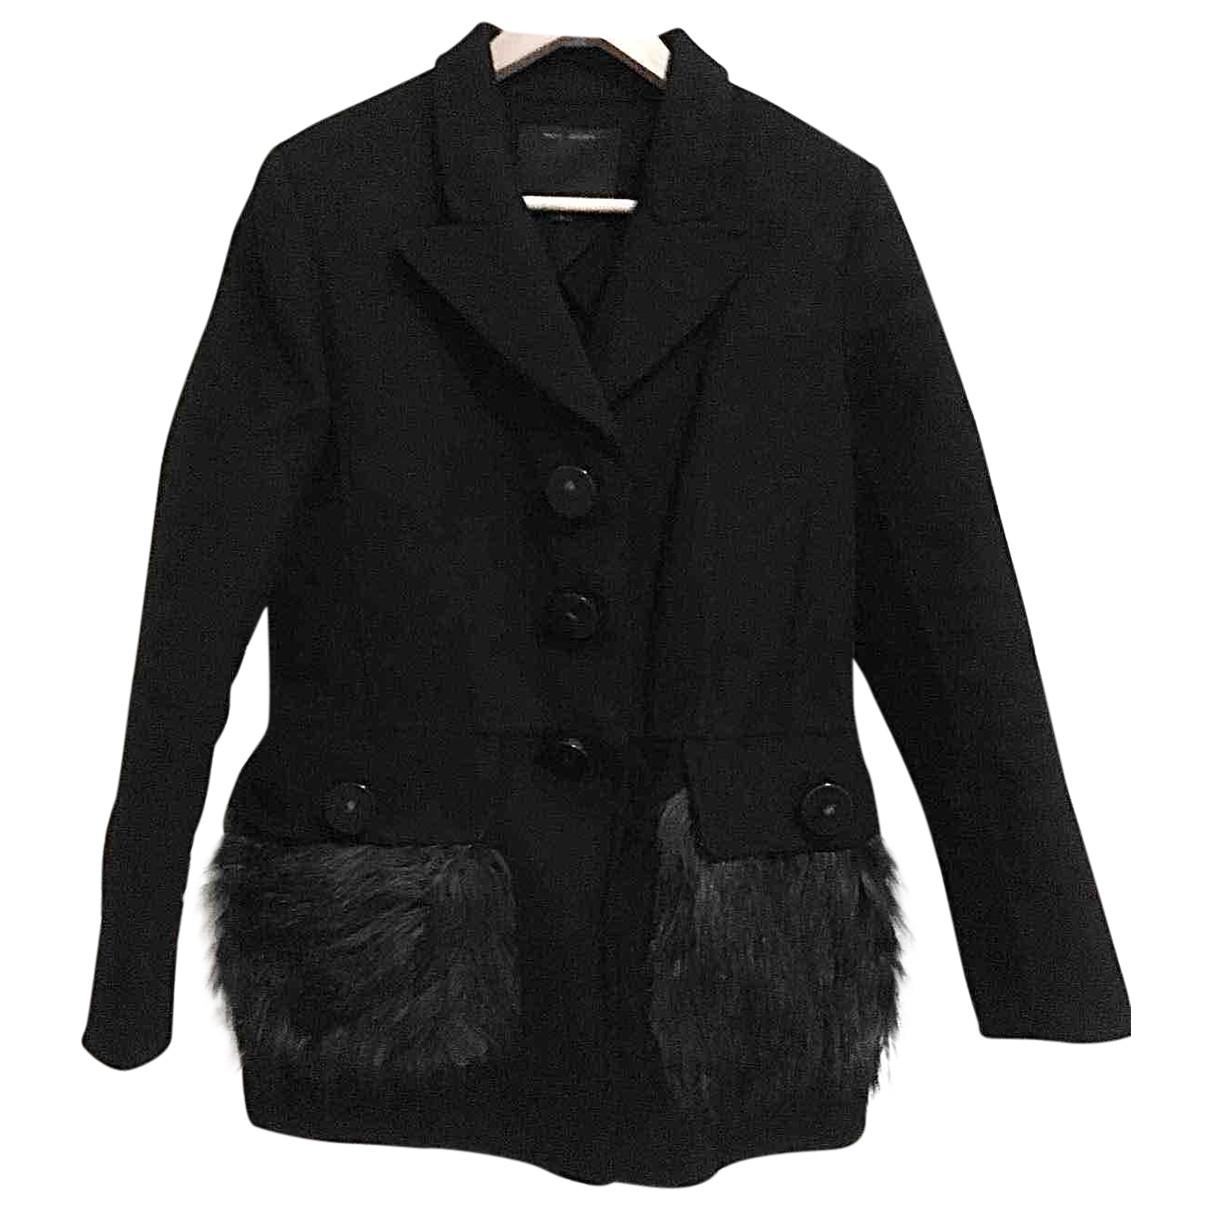 Marc Jacobs \N Black Wool coat for Women M International